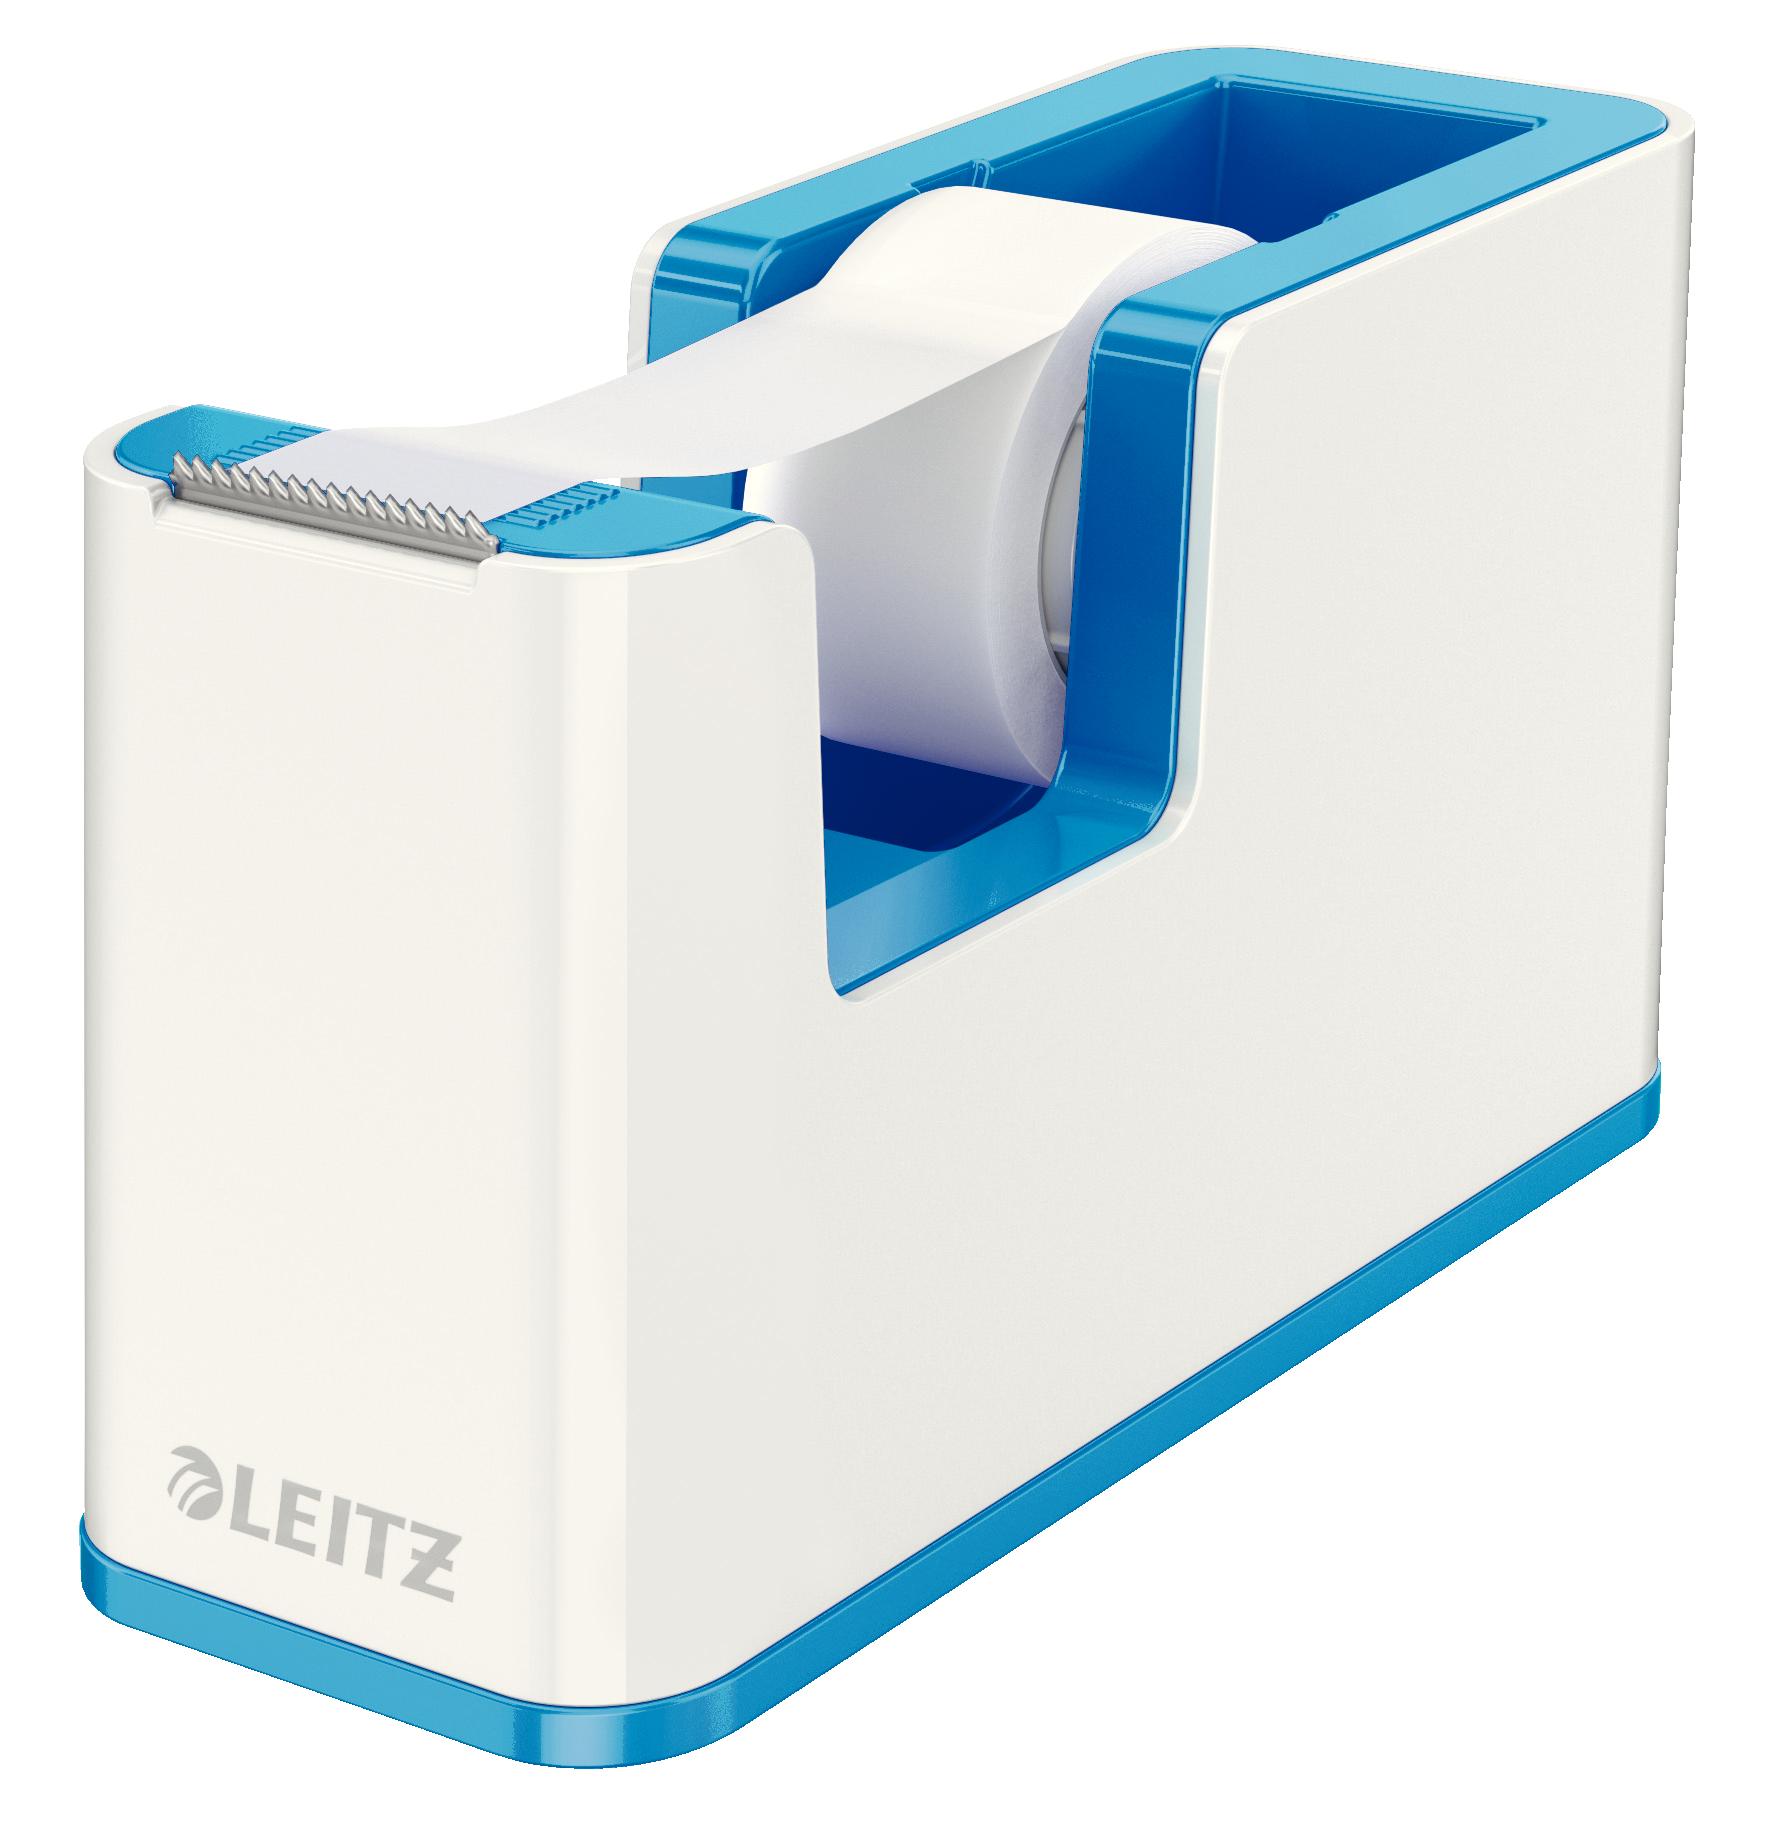 Leitz WOW Dual Colour Tape Dispenser for 19mm Tapes White/Blue 53641036